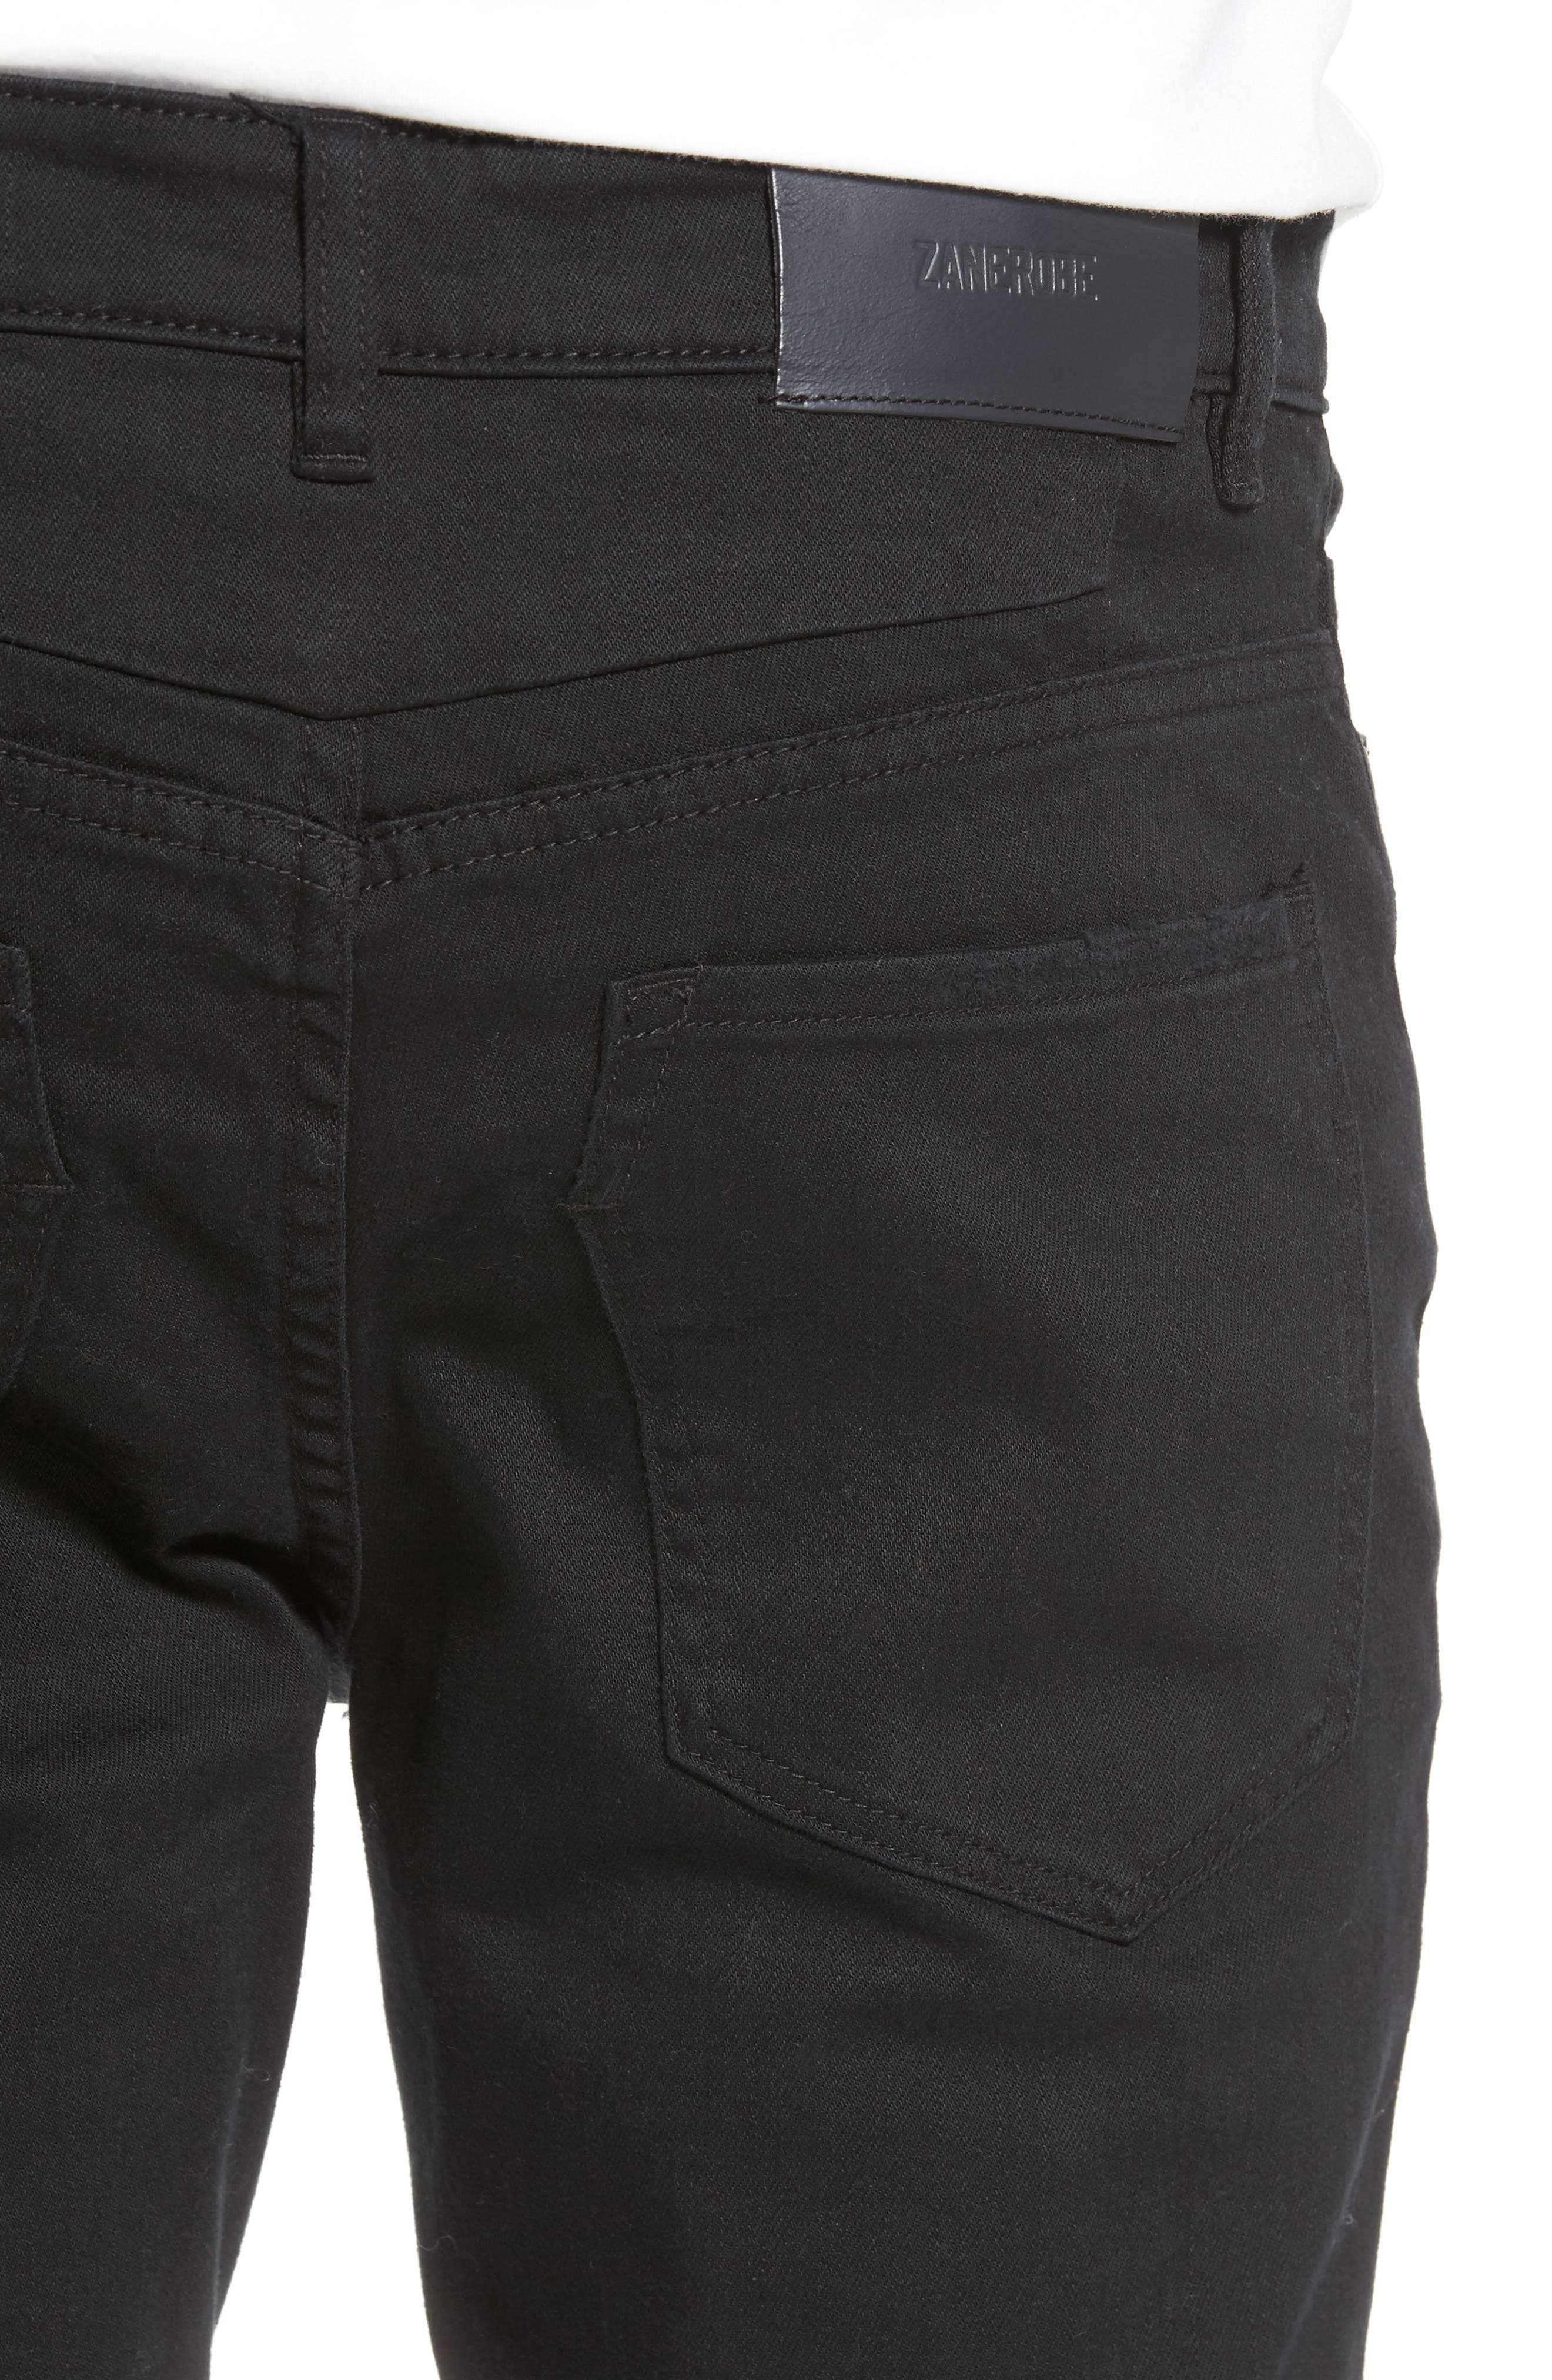 Joe Blow Destroyed Denim Jeans,                             Alternate thumbnail 4, color,                             Black Shred